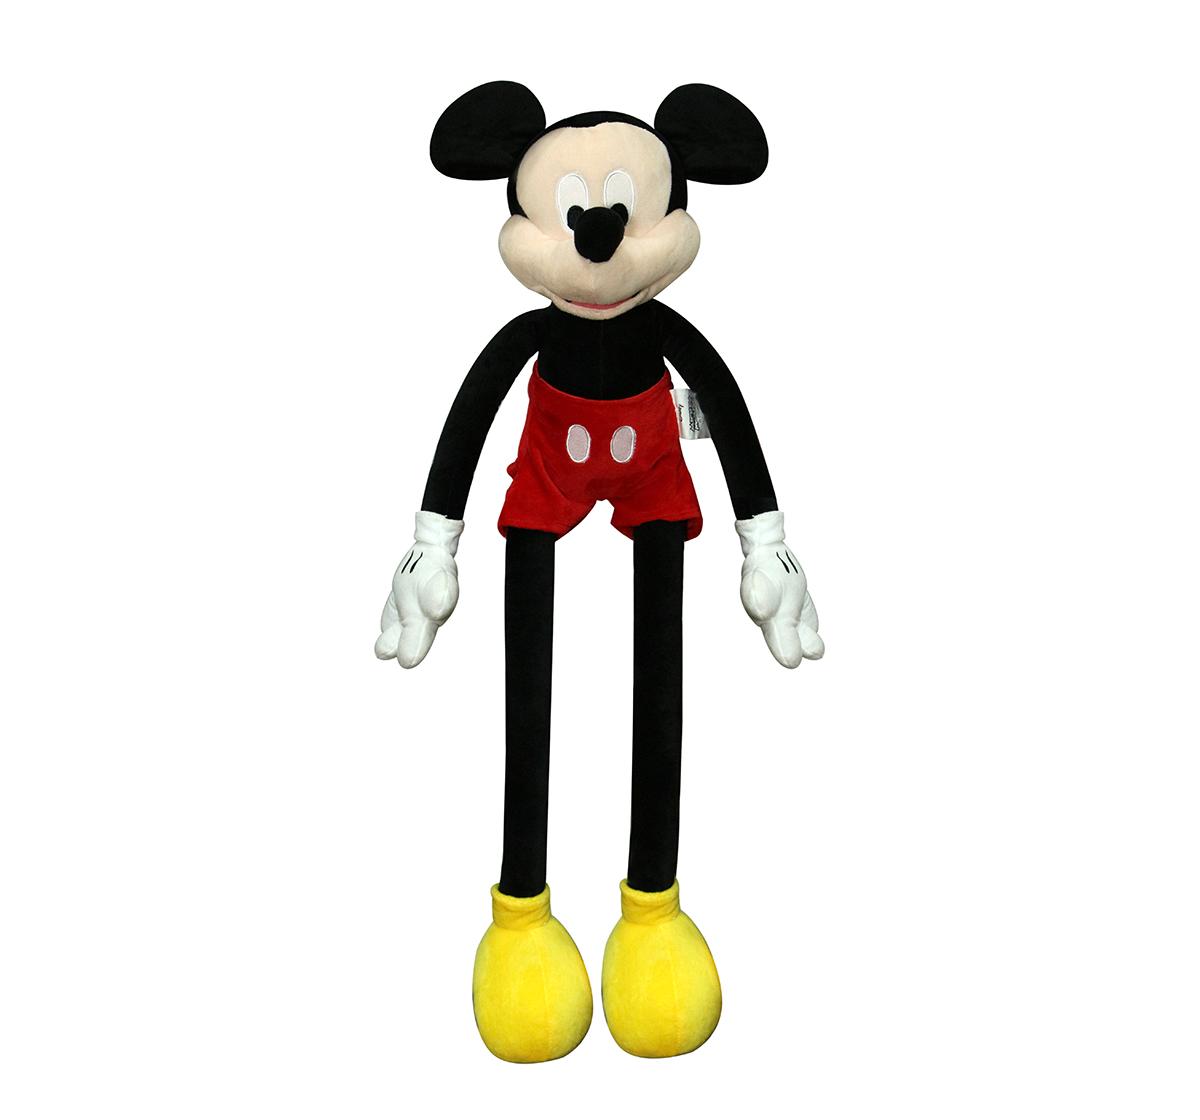 Disney | Disney Mickey Huggbale 72 Cm Character Soft Toys for Kids age 12M+ - 72 Cm